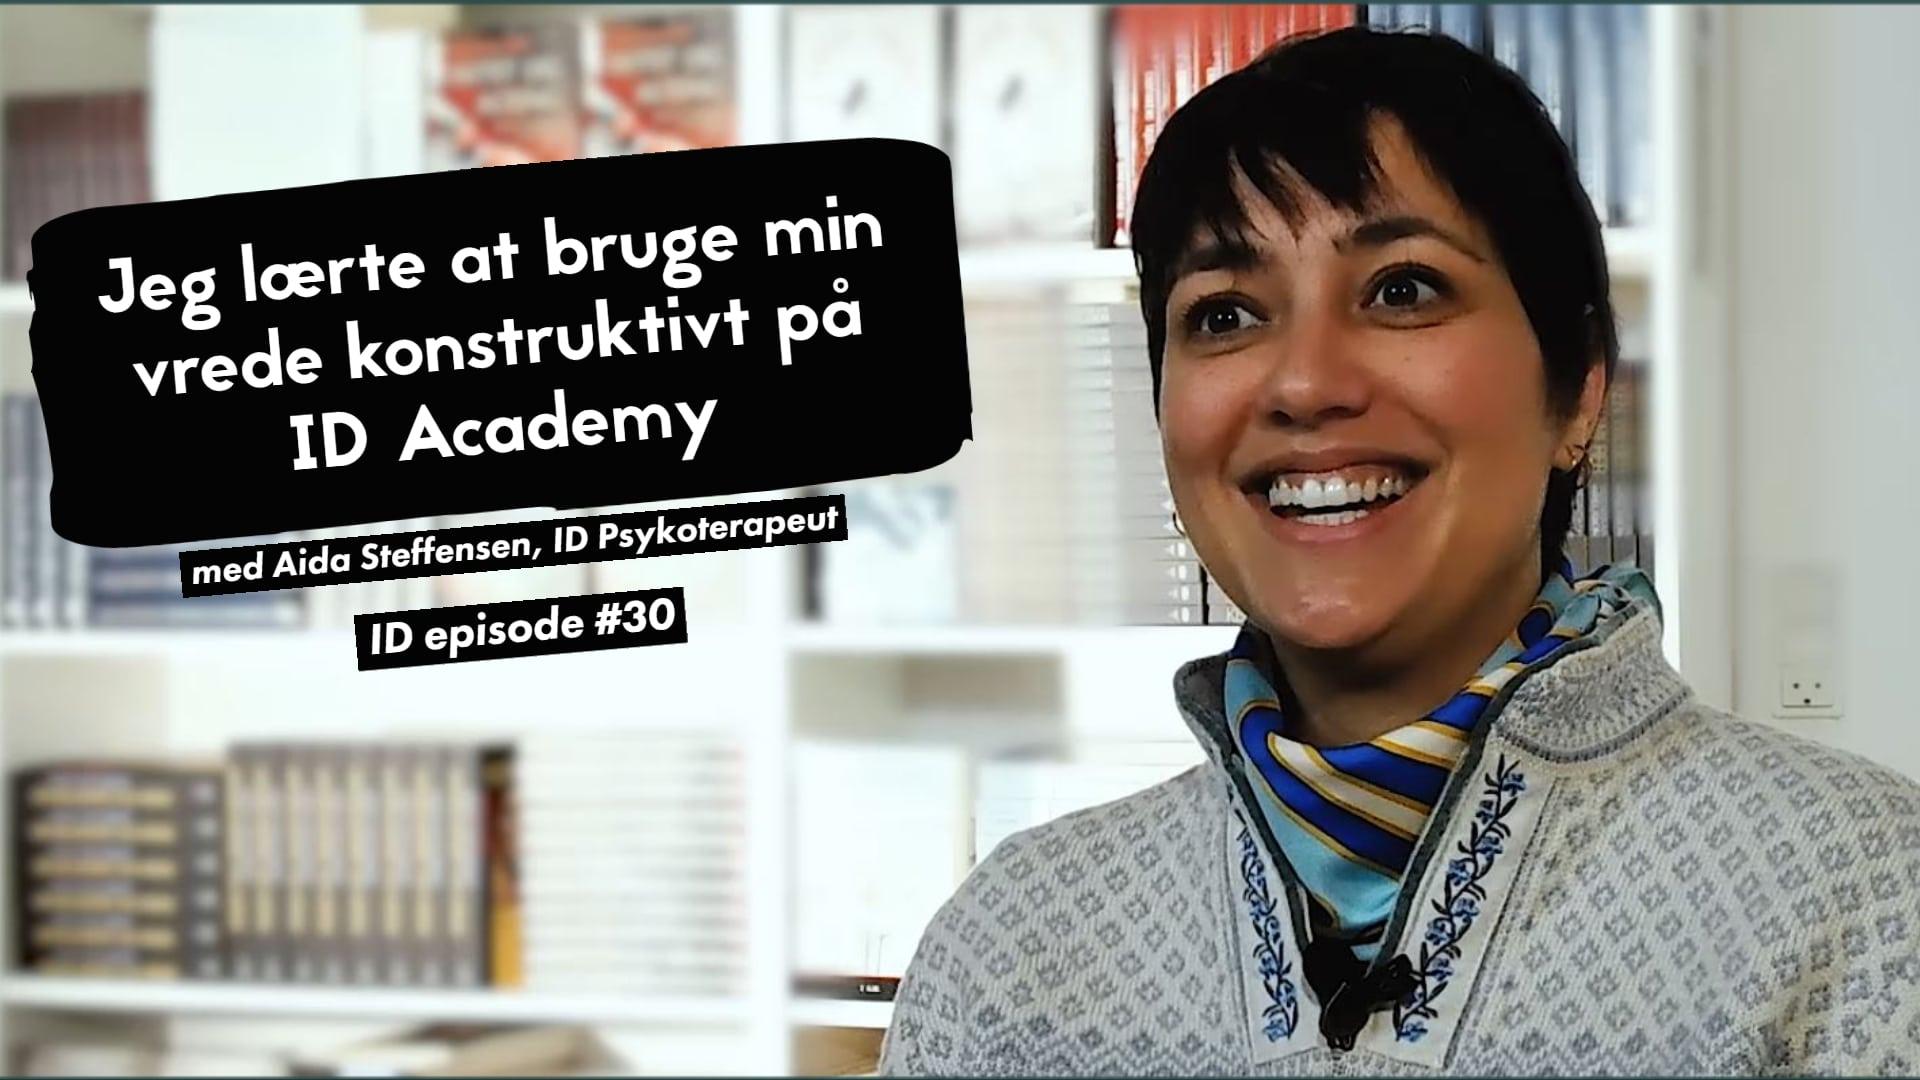 ID Psykoterapeut Aida Steffensen